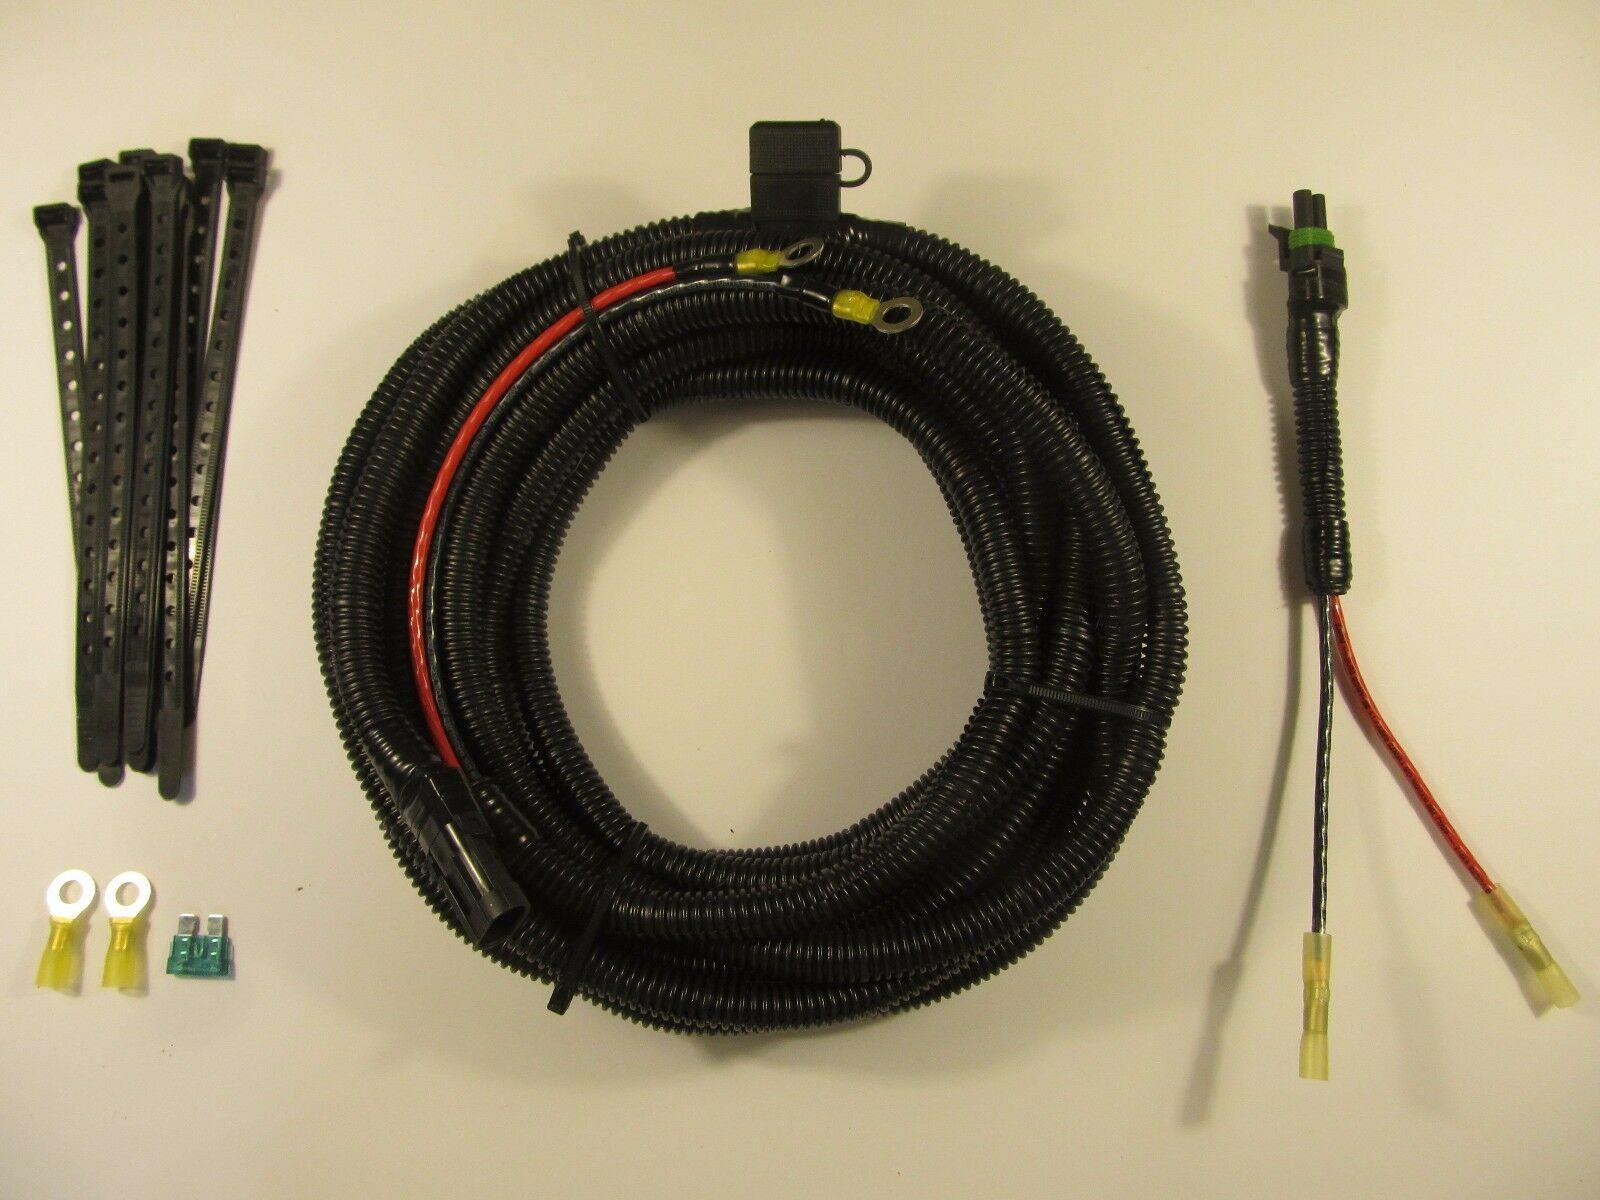 DK_4471] Harmar Lift Wiring Harness Free DiagramPneu Coun Boapu Mohammedshrine Librar Wiring 101